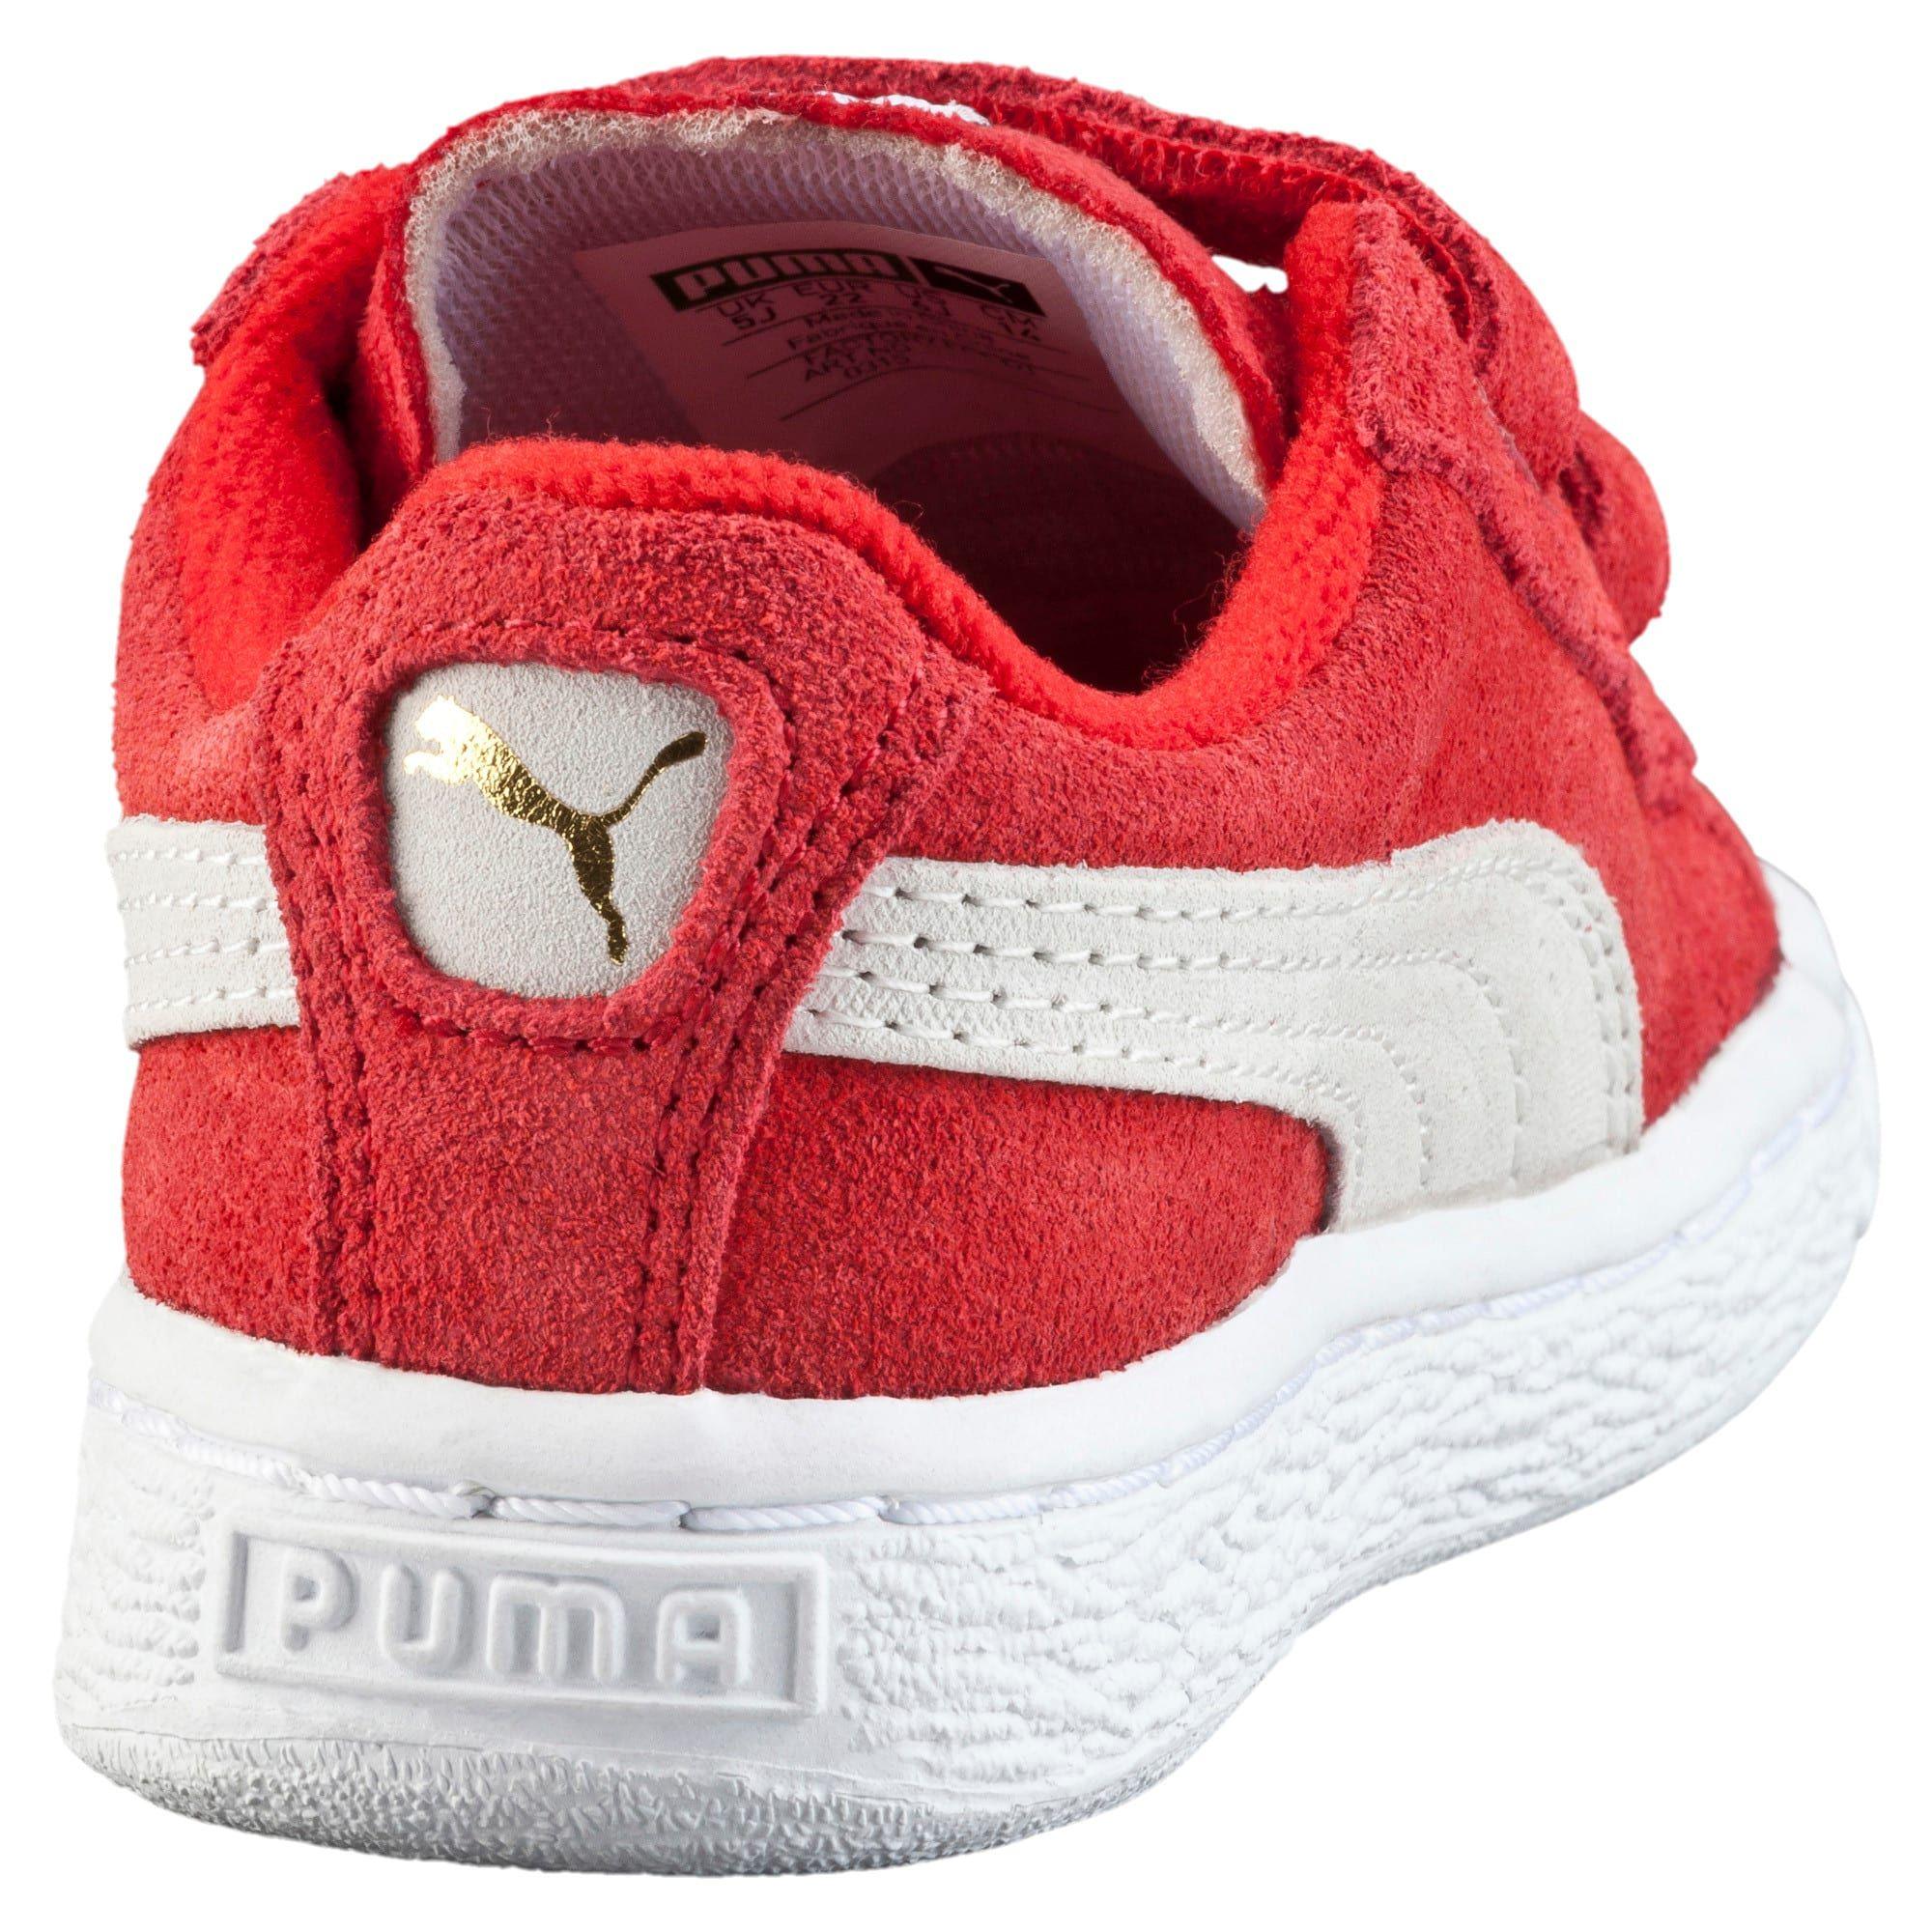 PUMA Suede 2 Straps Trainers in High Risk RedWhite size 4.5